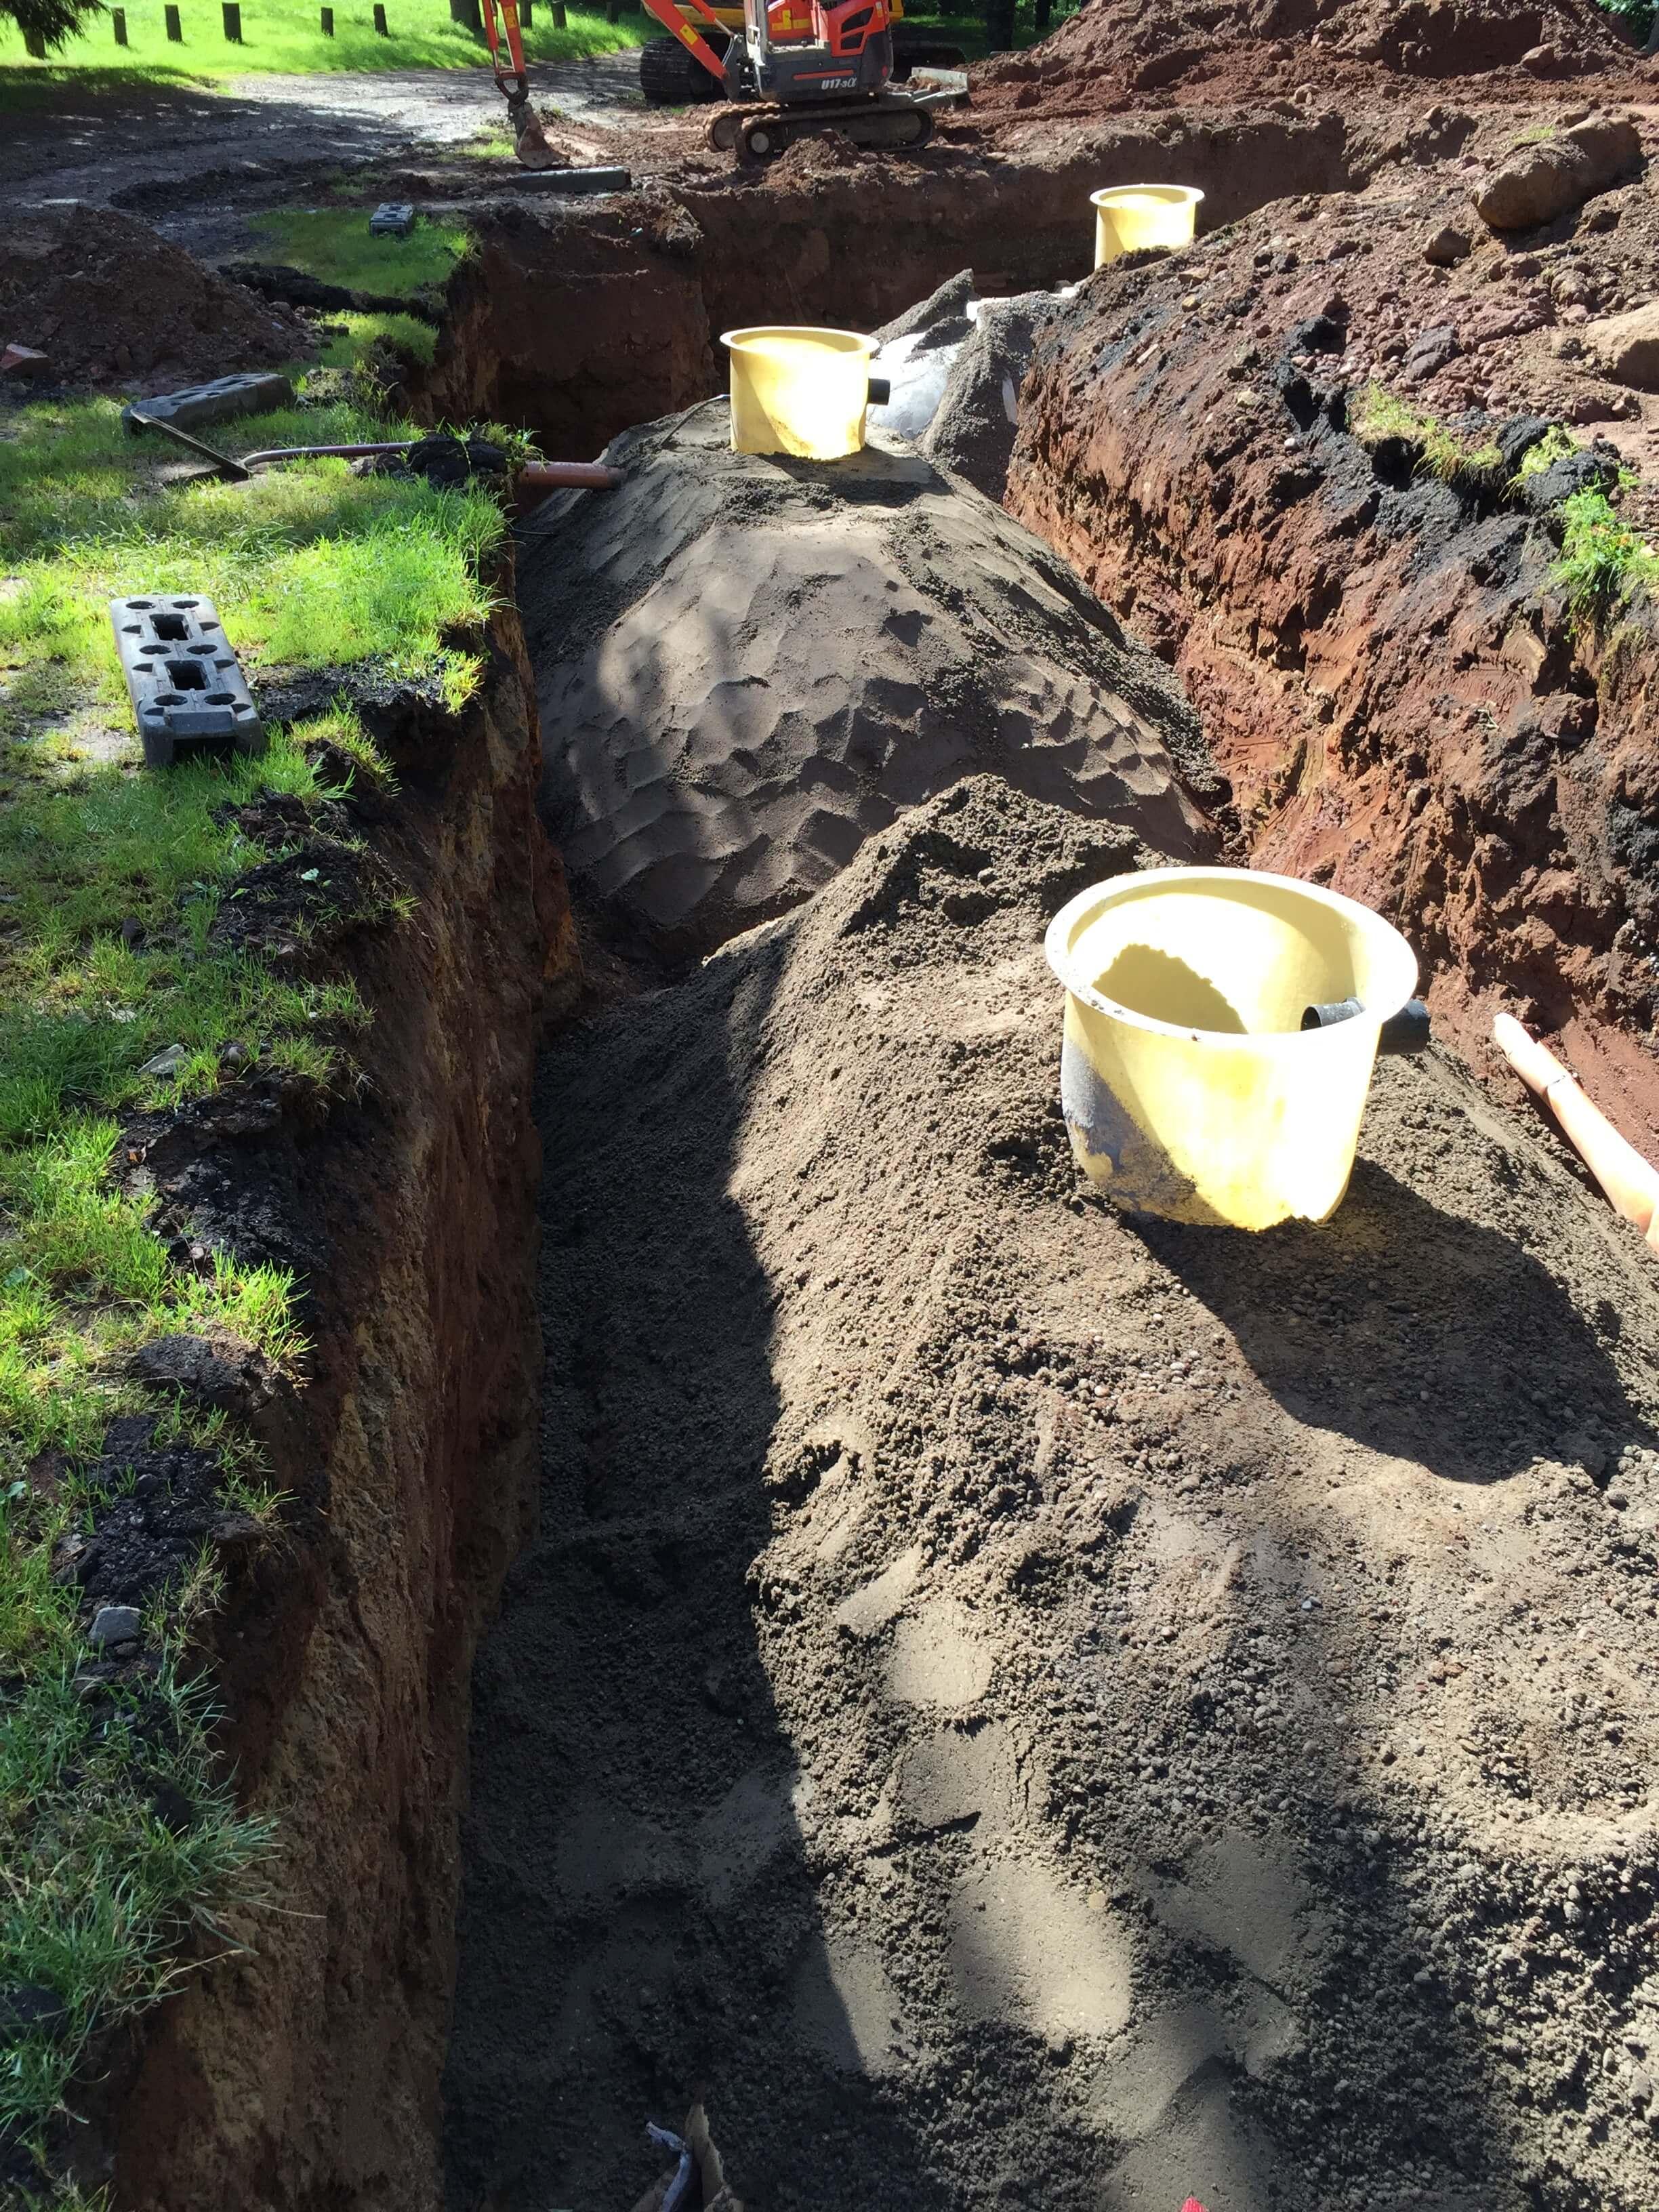 Large septic tanks buried underground